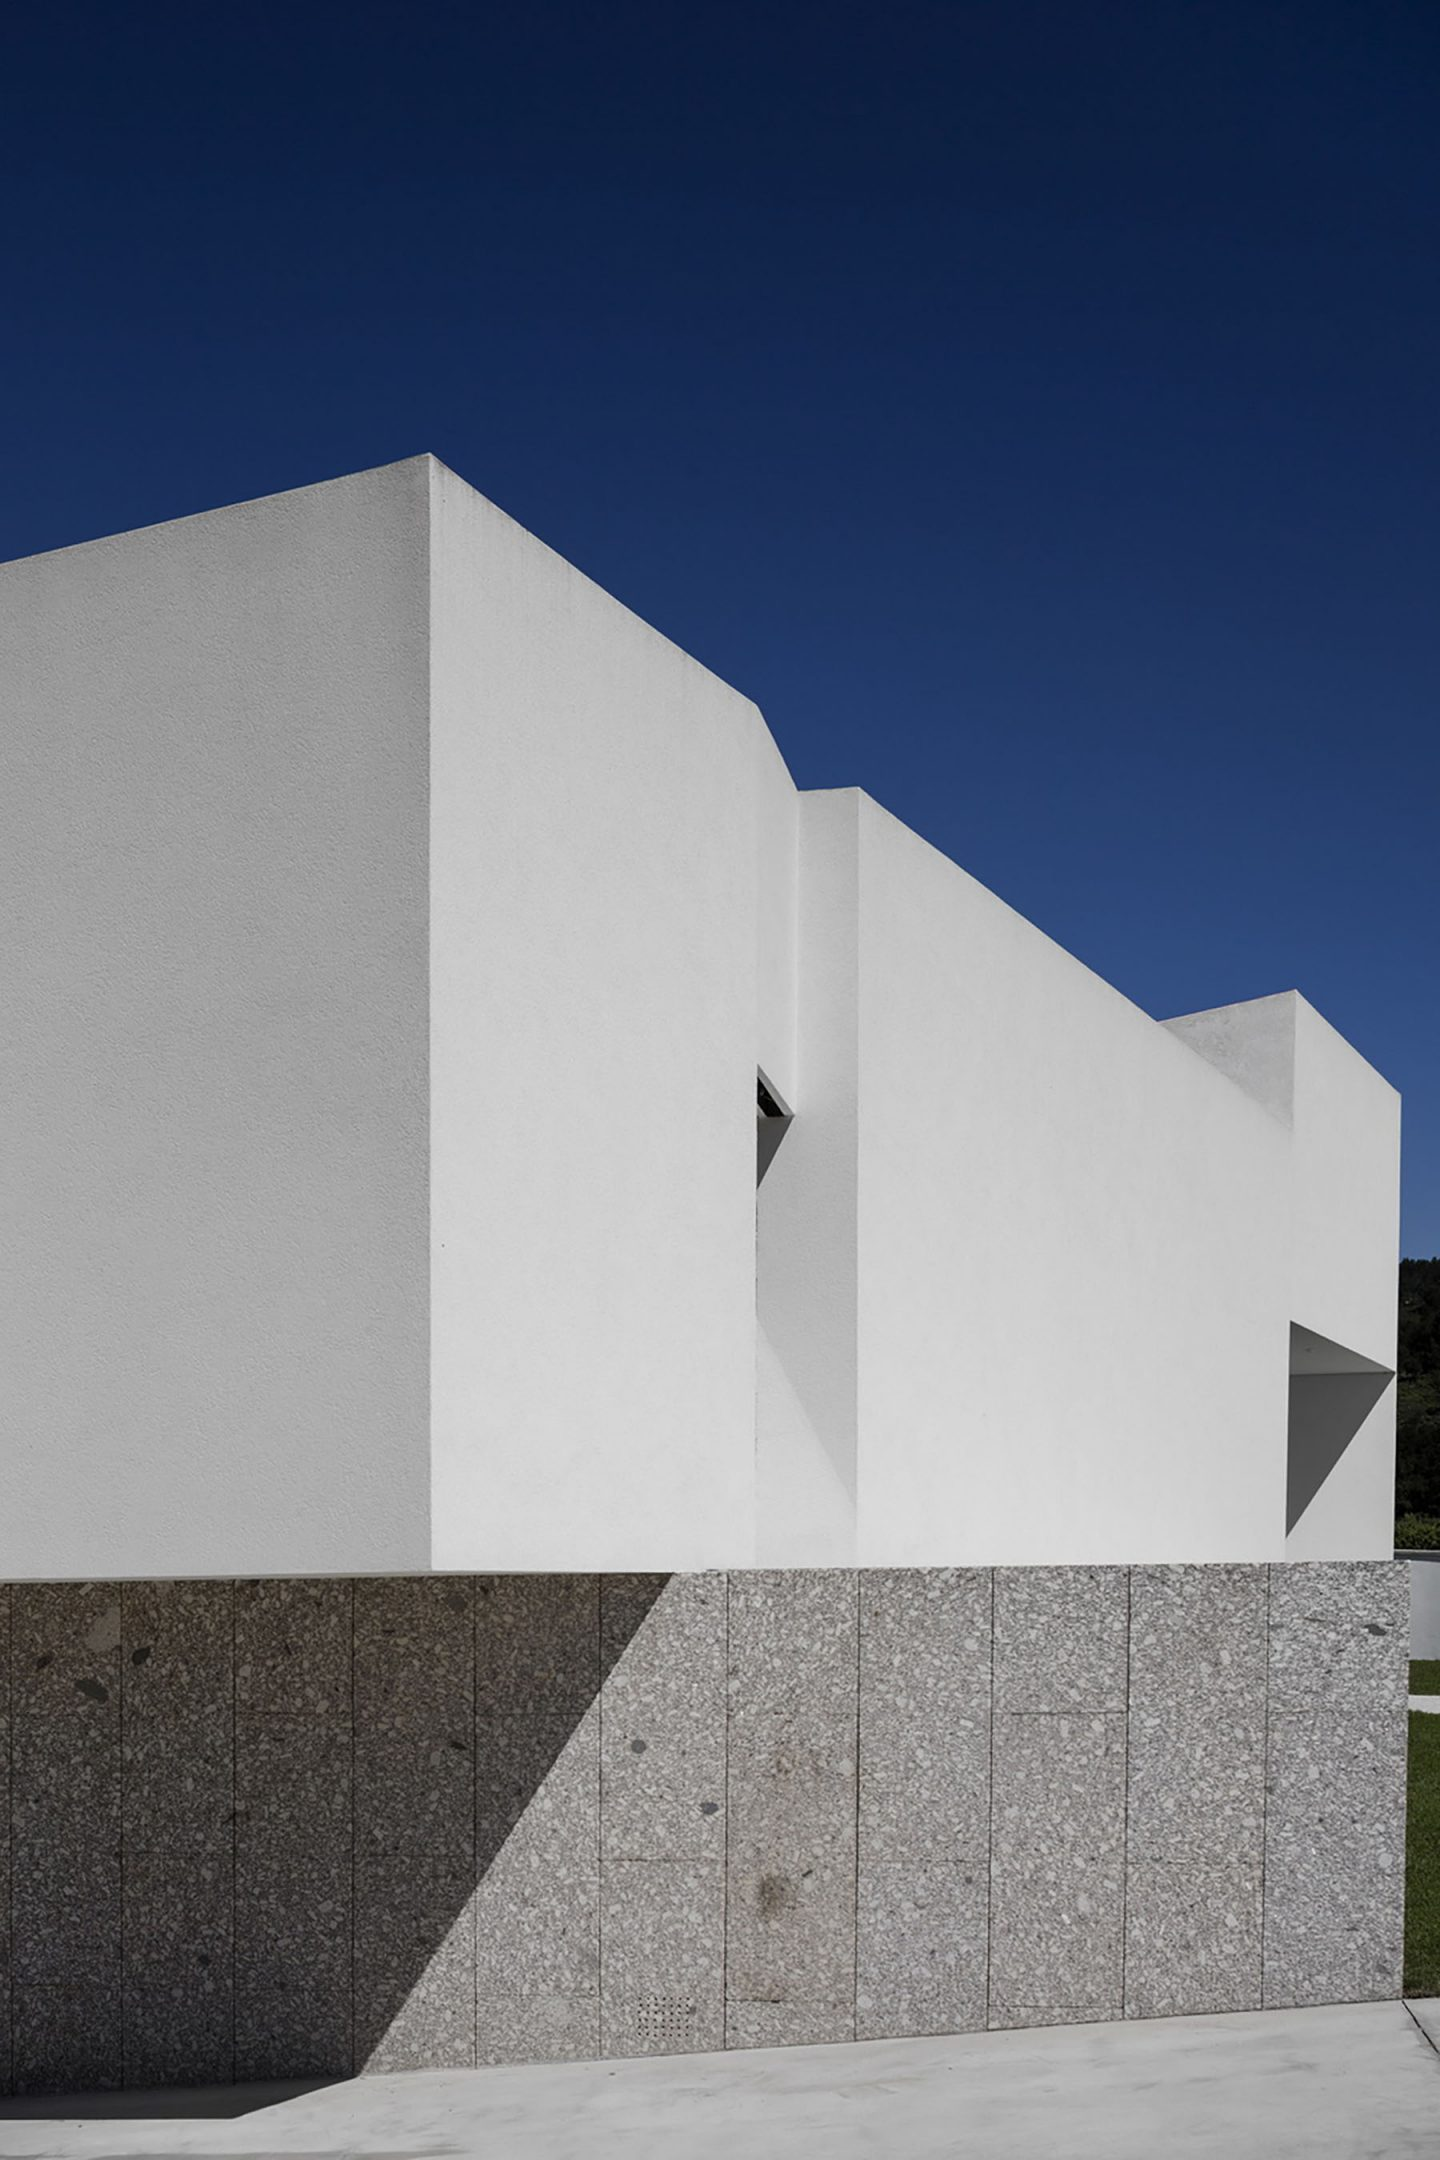 iGNANT-Architecture-Rue-Vieira-Oliveira-Brunhais-House-23